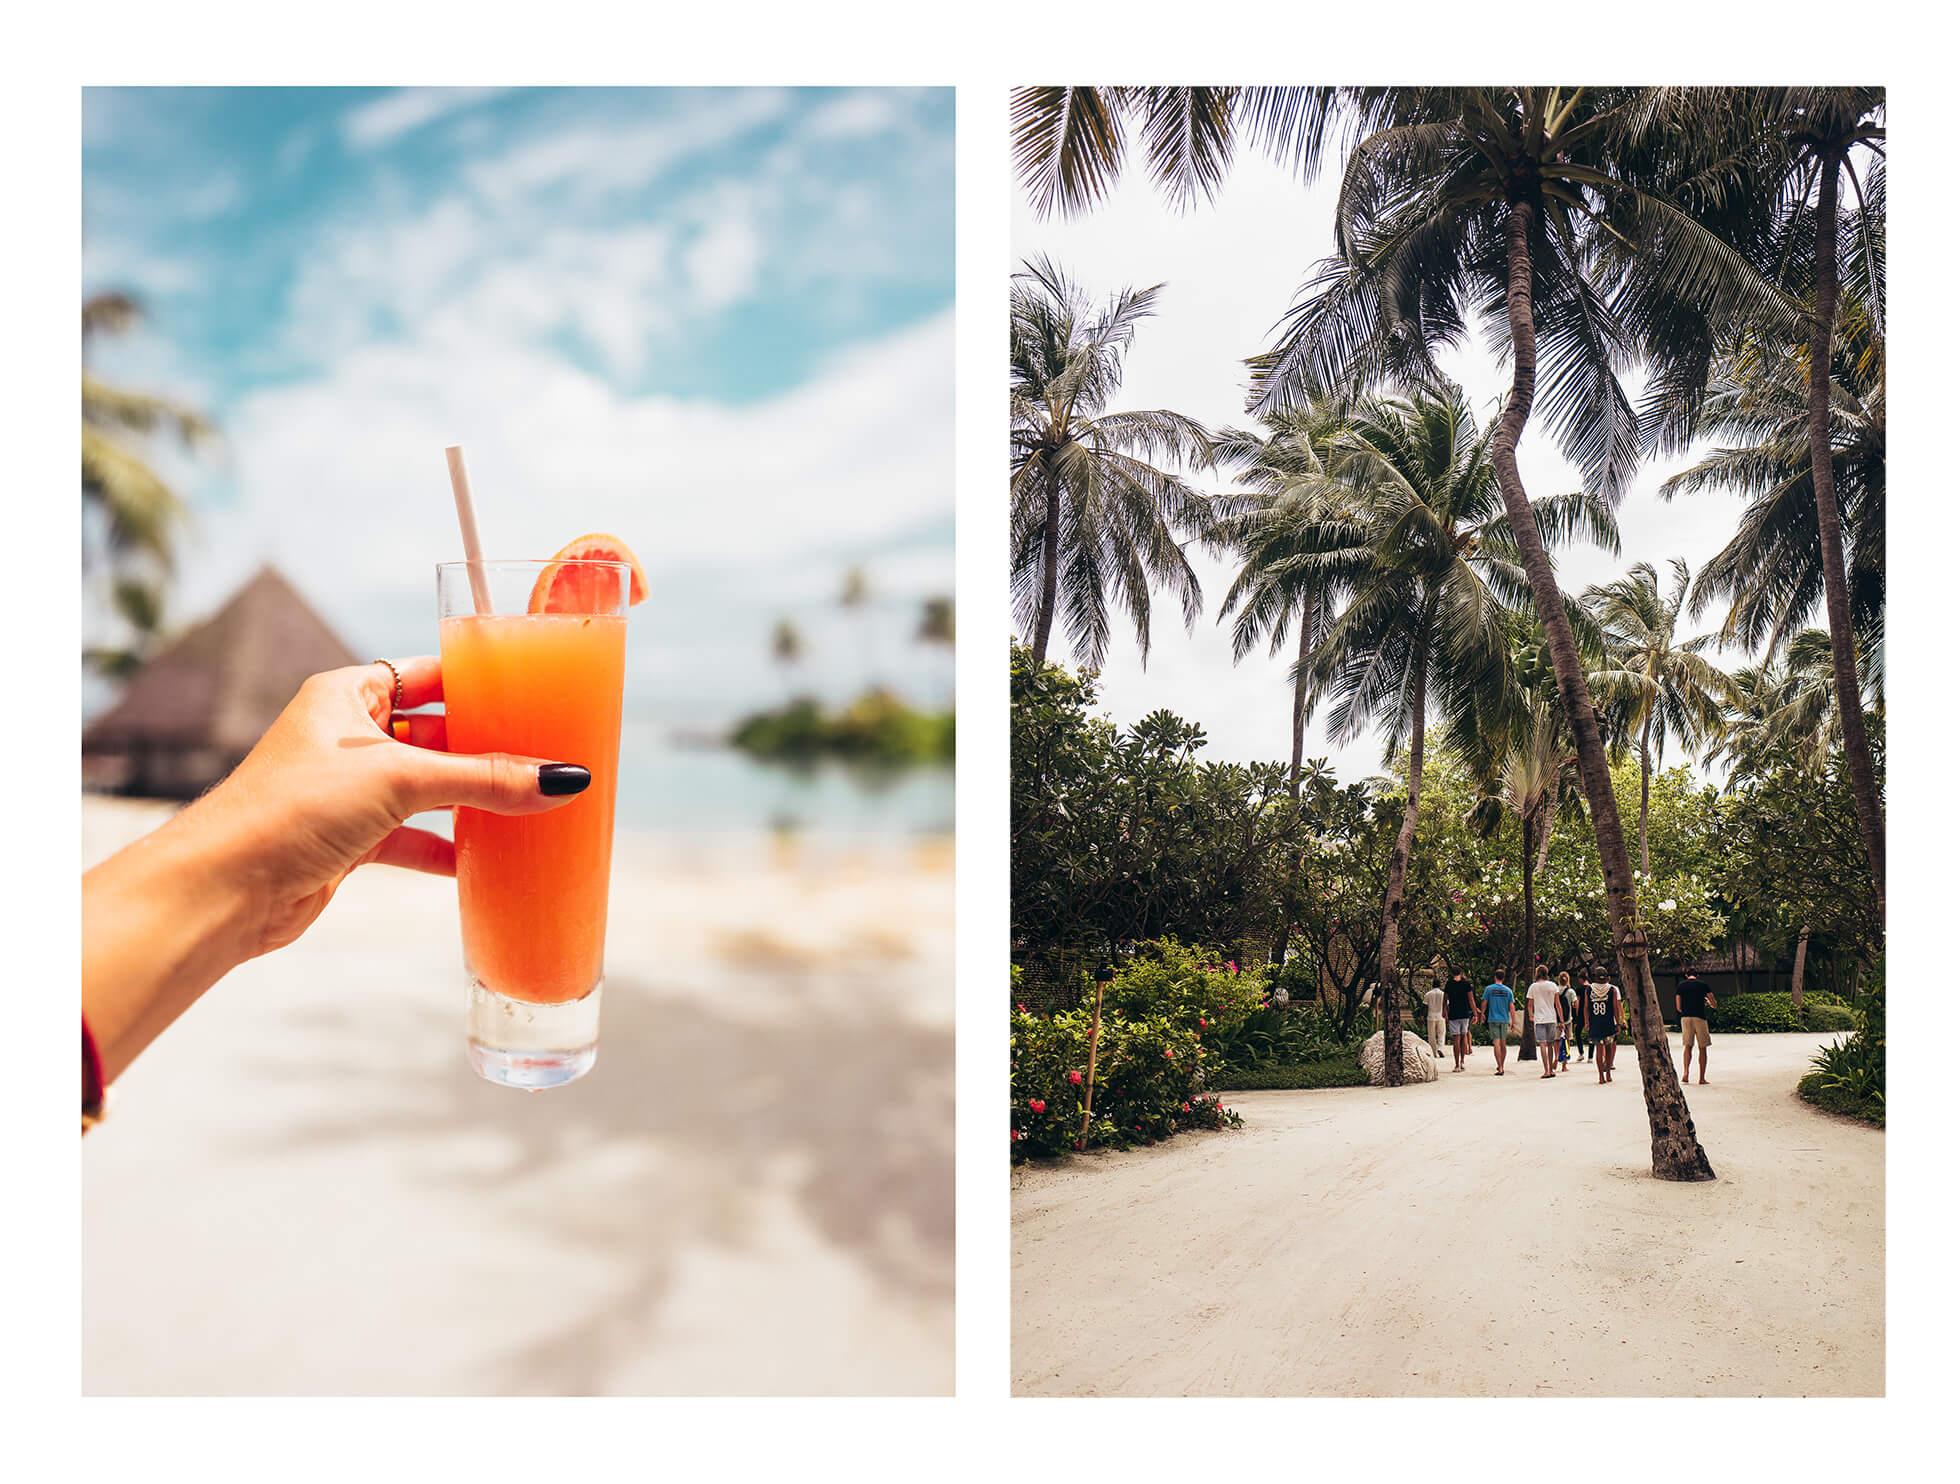 janni-deler-four-seasons-resort-maldivesl1140381-copy